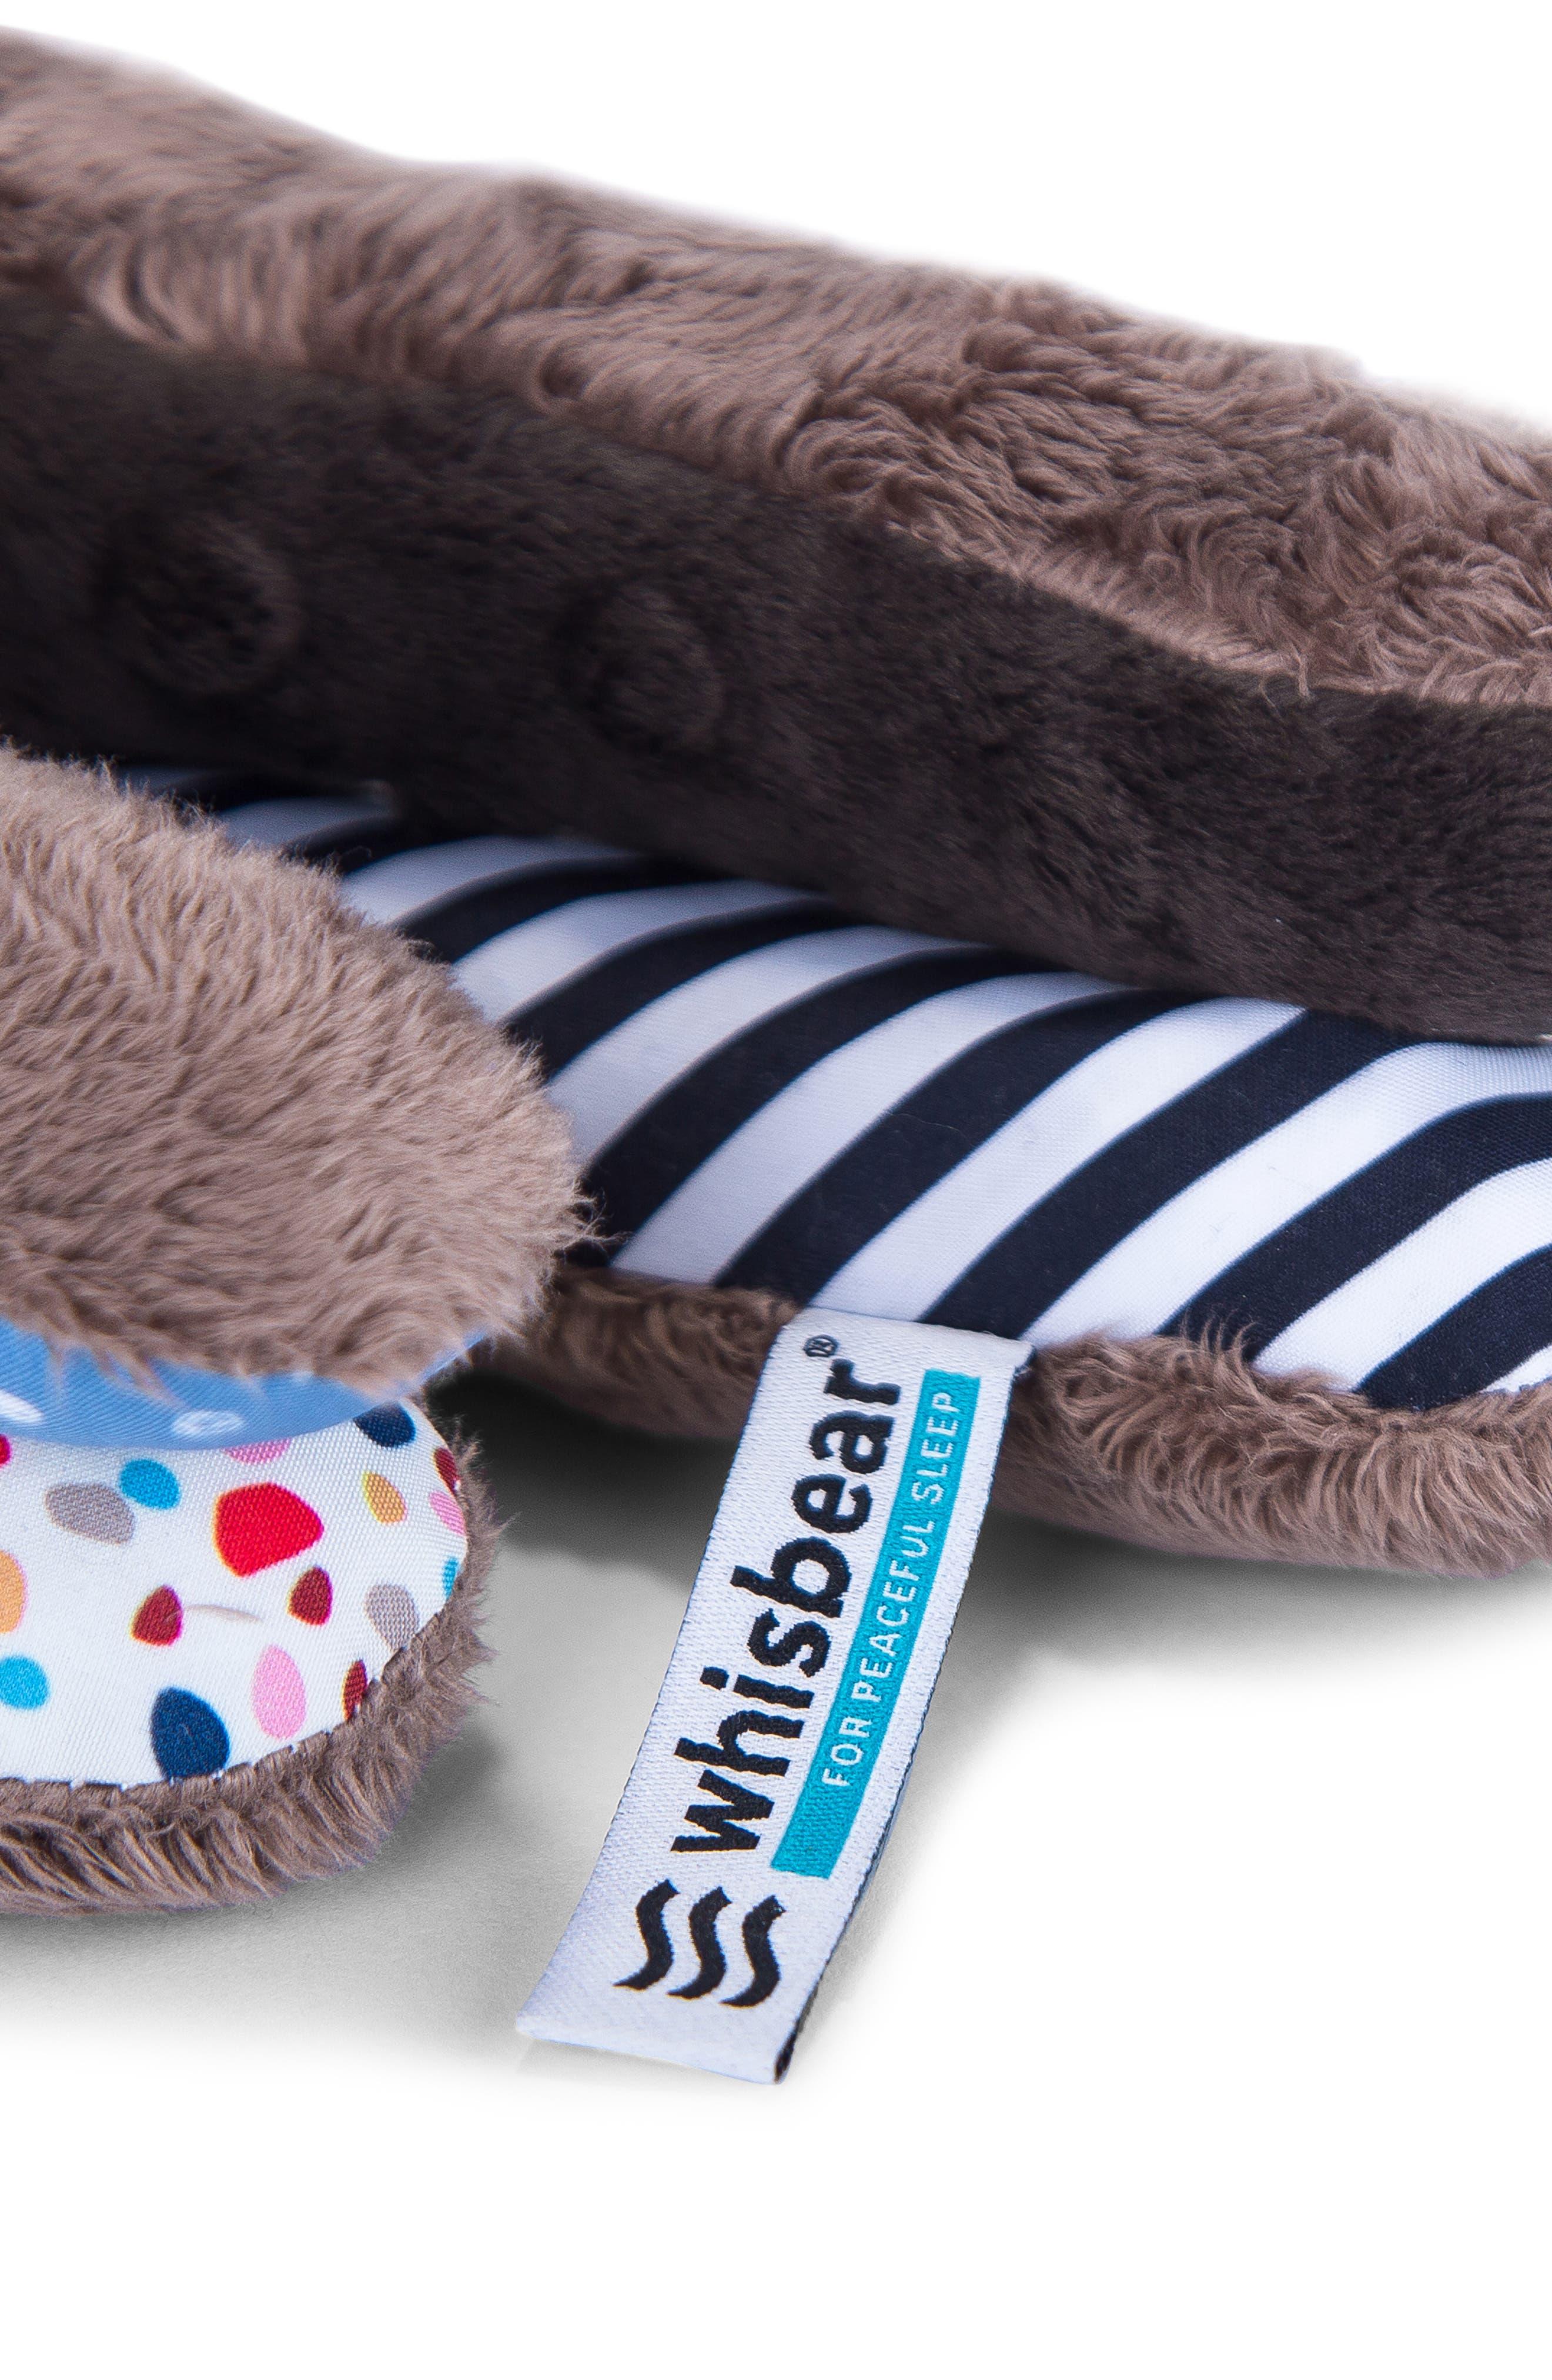 ,                             E-zzy the Sloth Baby Sleep Machine,                             Alternate thumbnail 2, color,                             200